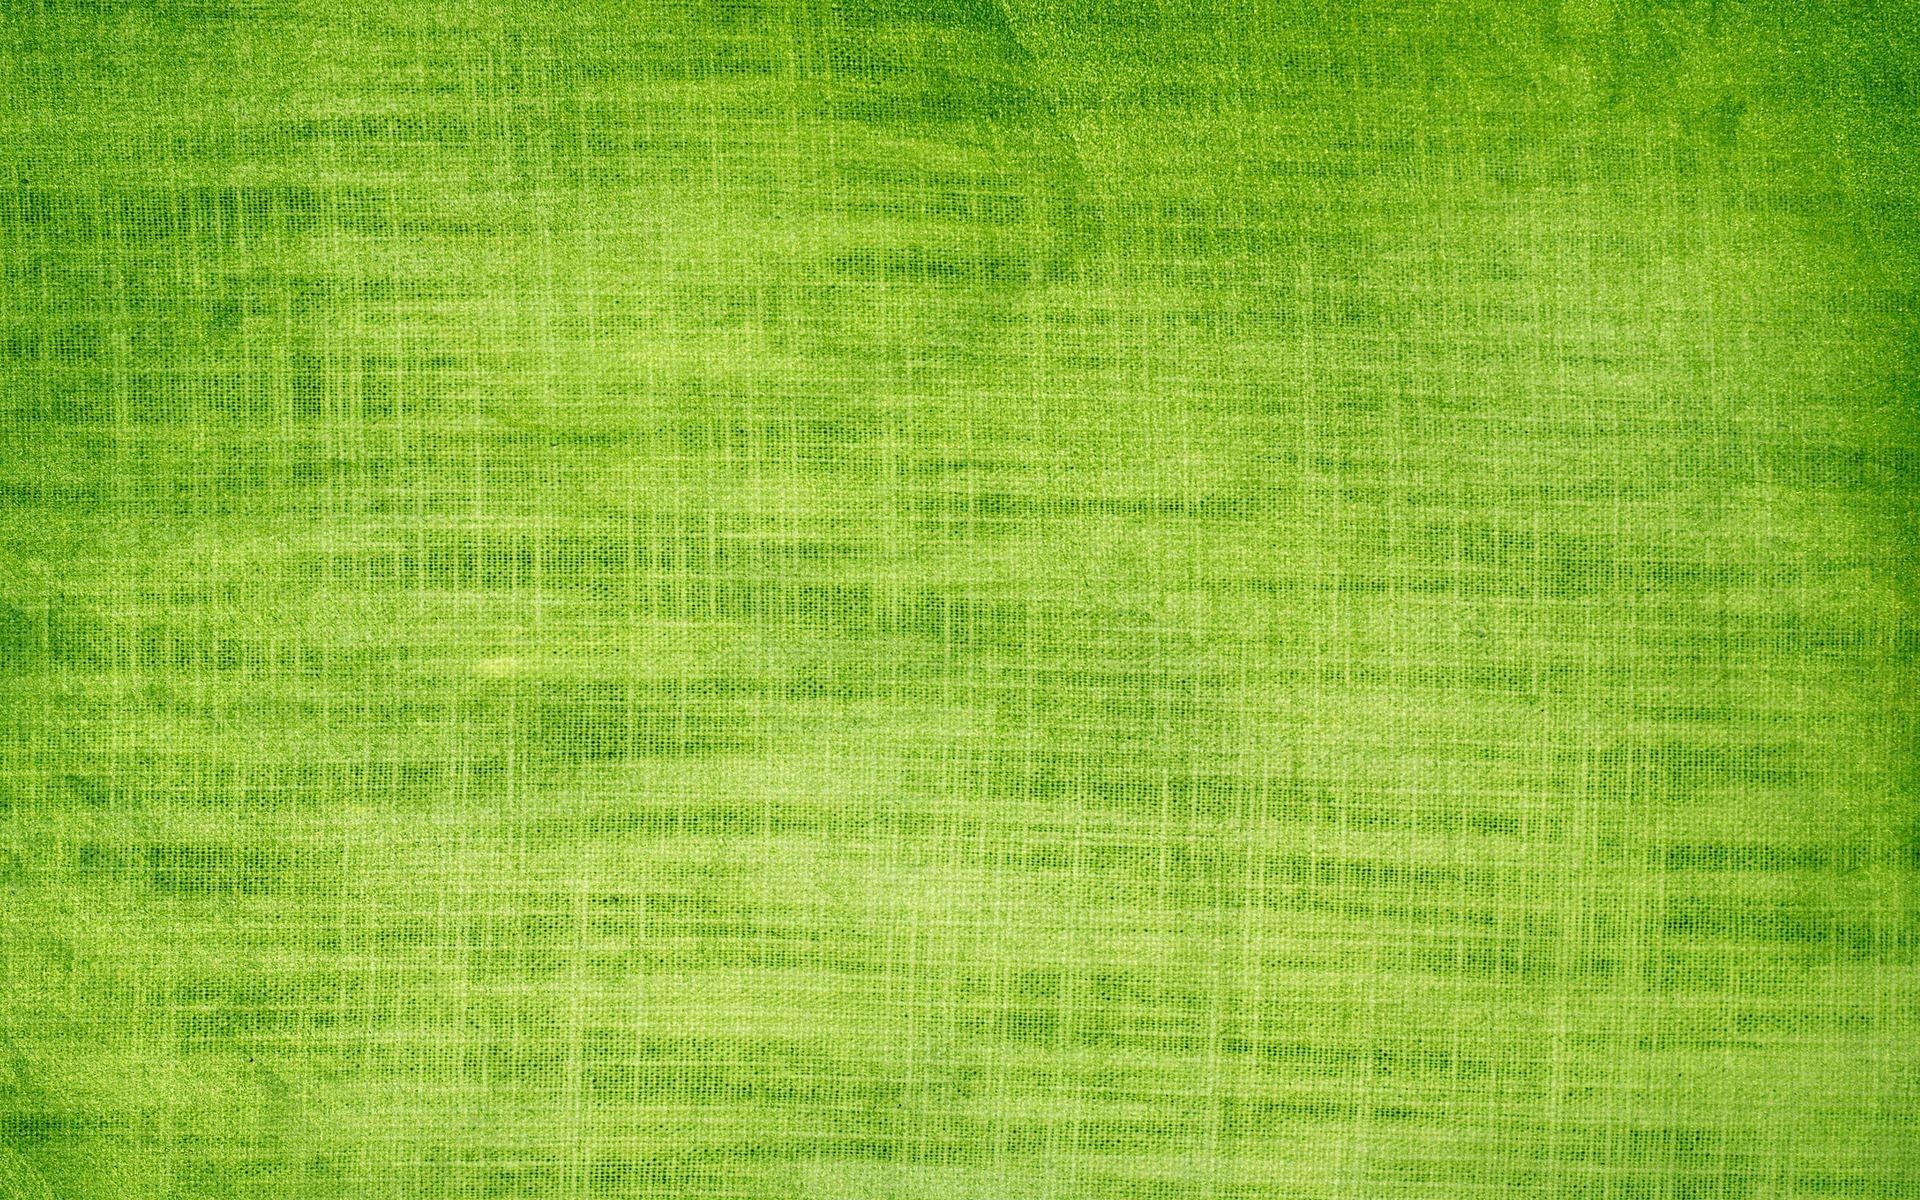 best ideas about Textured wallpaper on Pinterest Textured